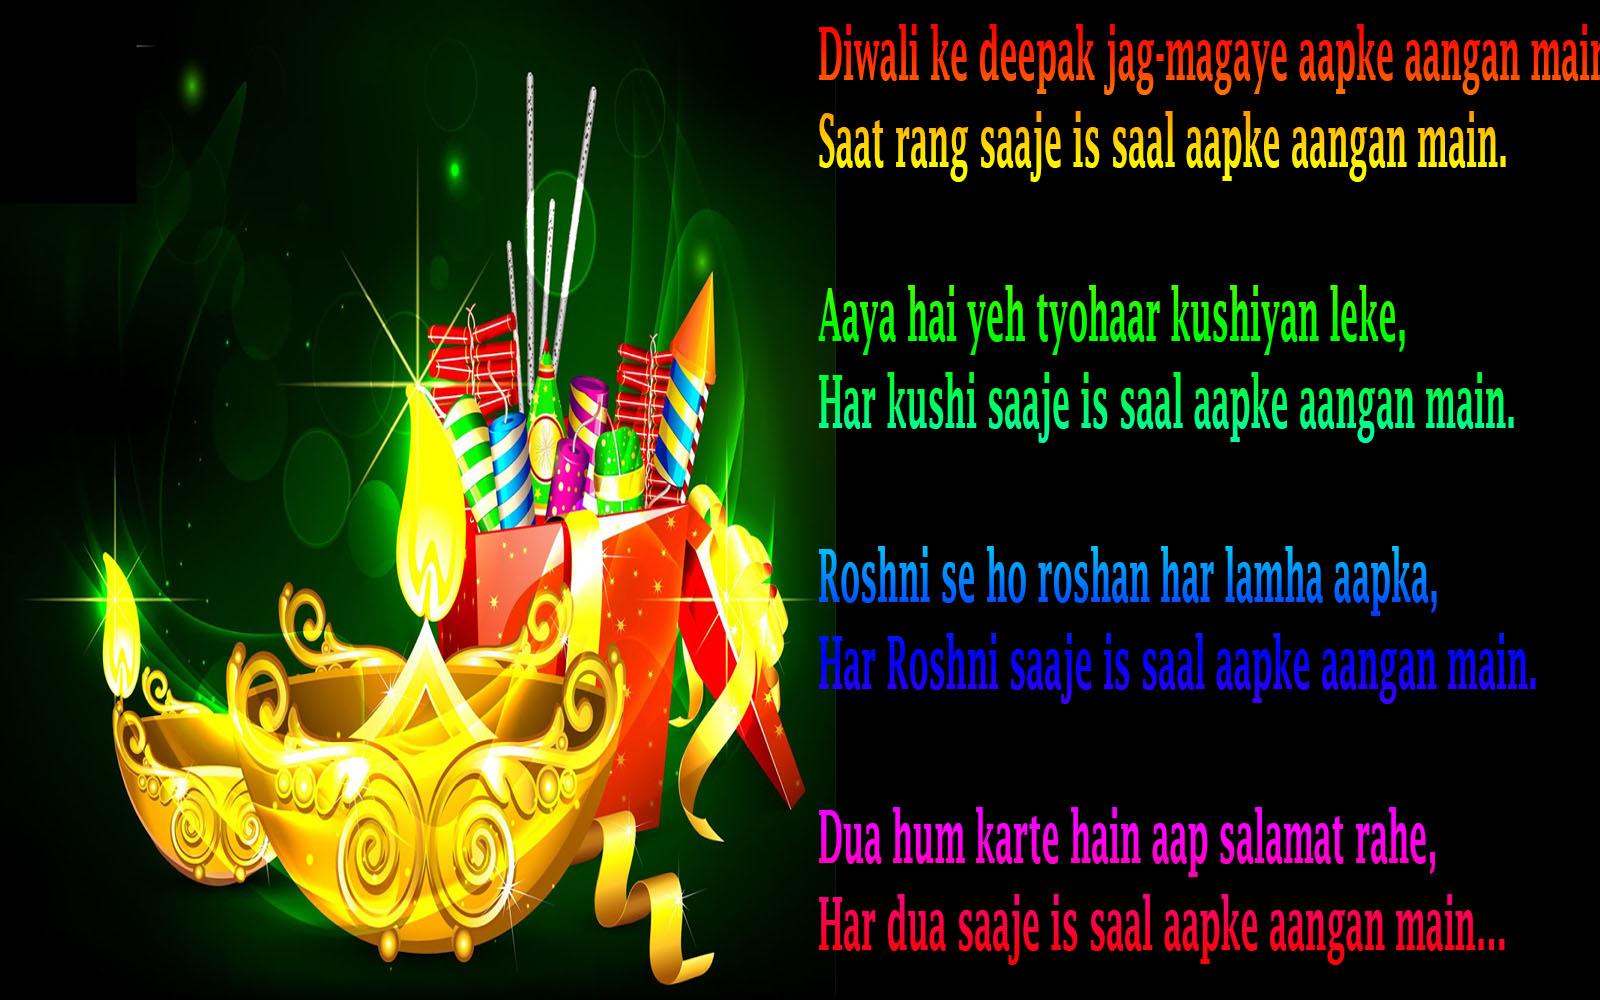 Diwali 2015 Best Image Greetings Whatsapp Messages